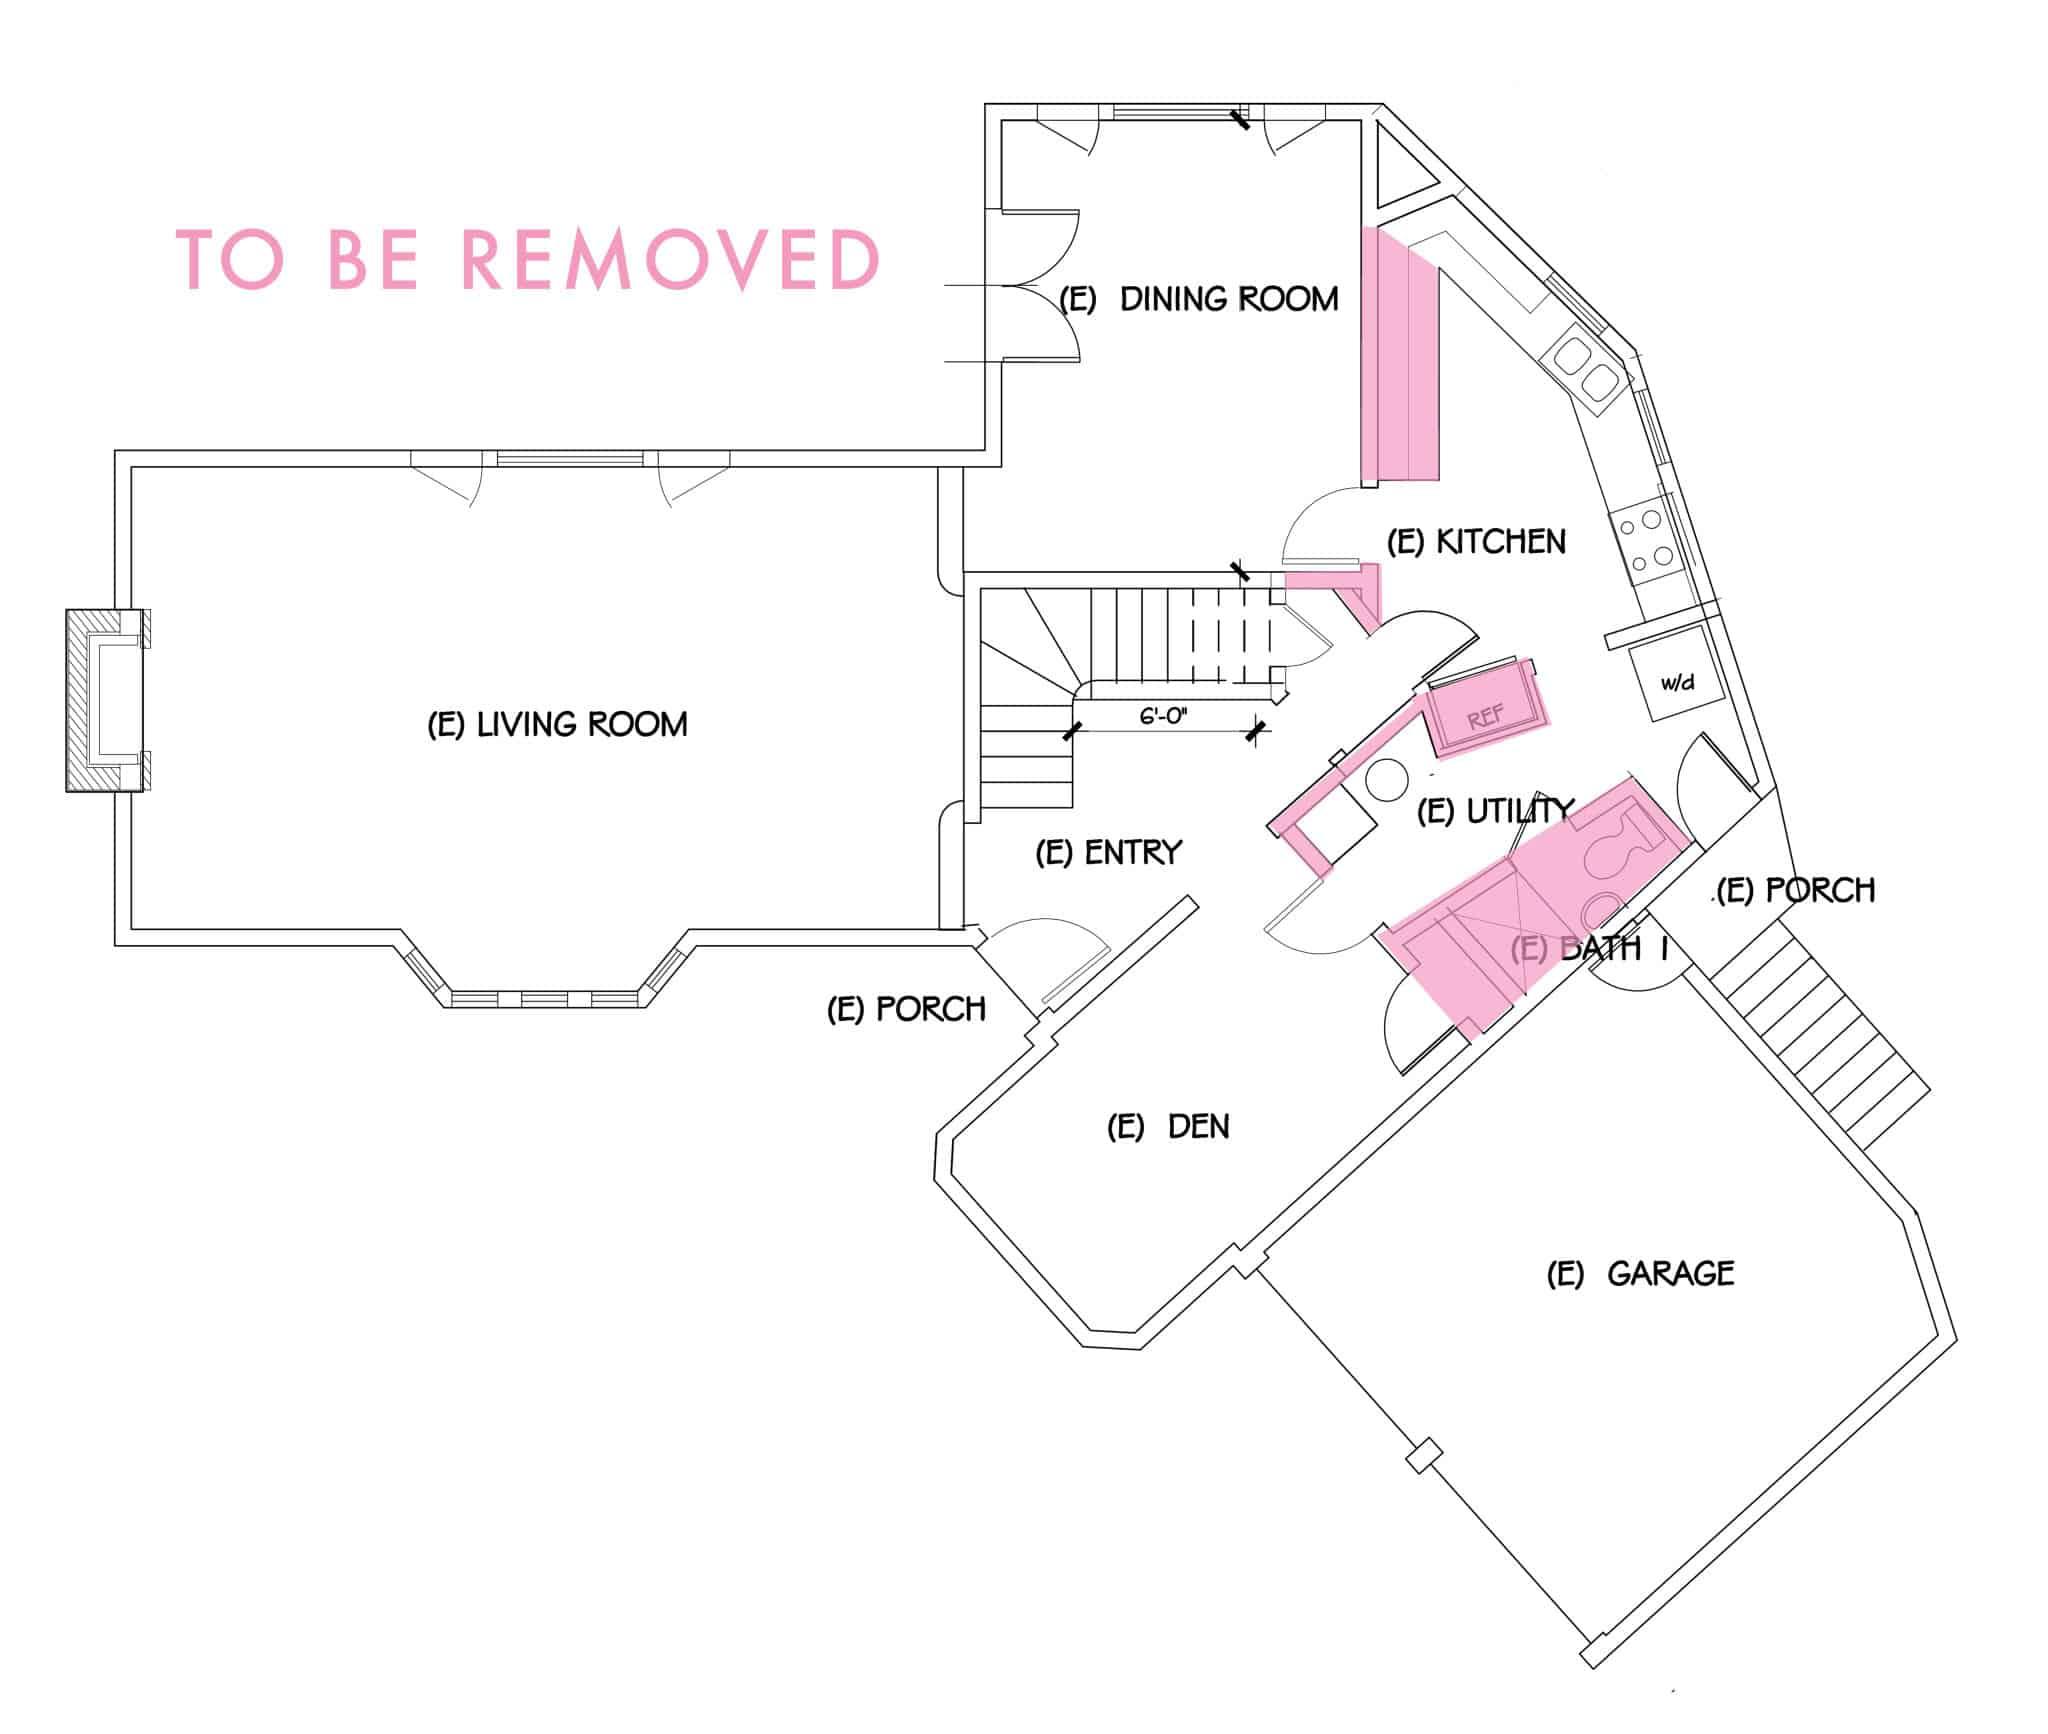 original_floor-plan_revised-floor-plan_to-be-removed-5